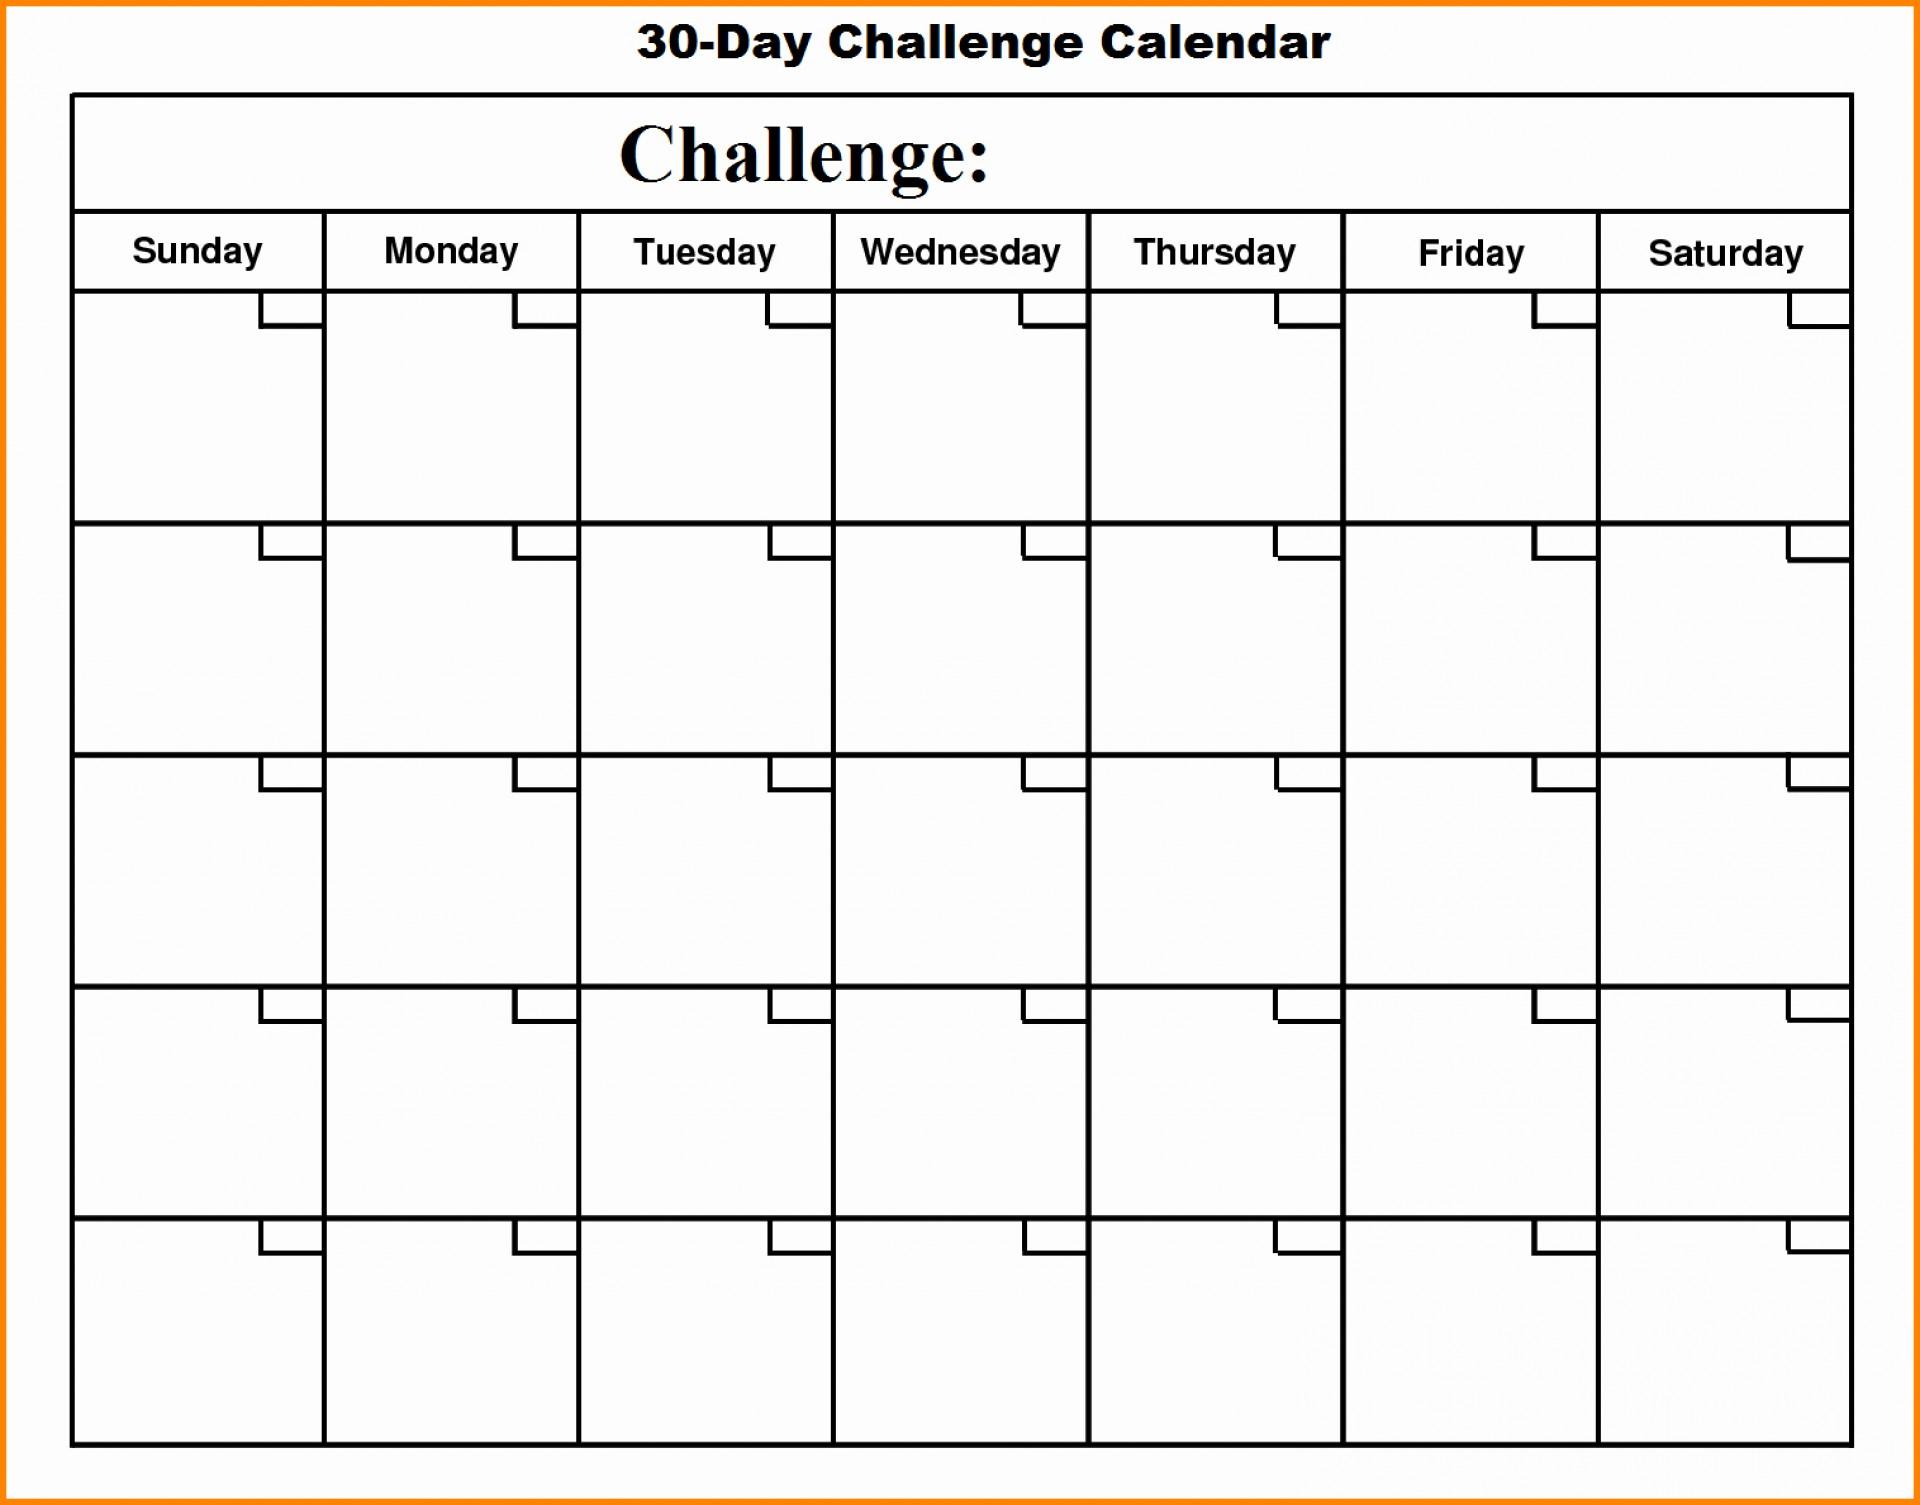 001 Template Ideas Day Dreaded 30 Calendar Pdf Challenge for 30 Day Calendar Printable